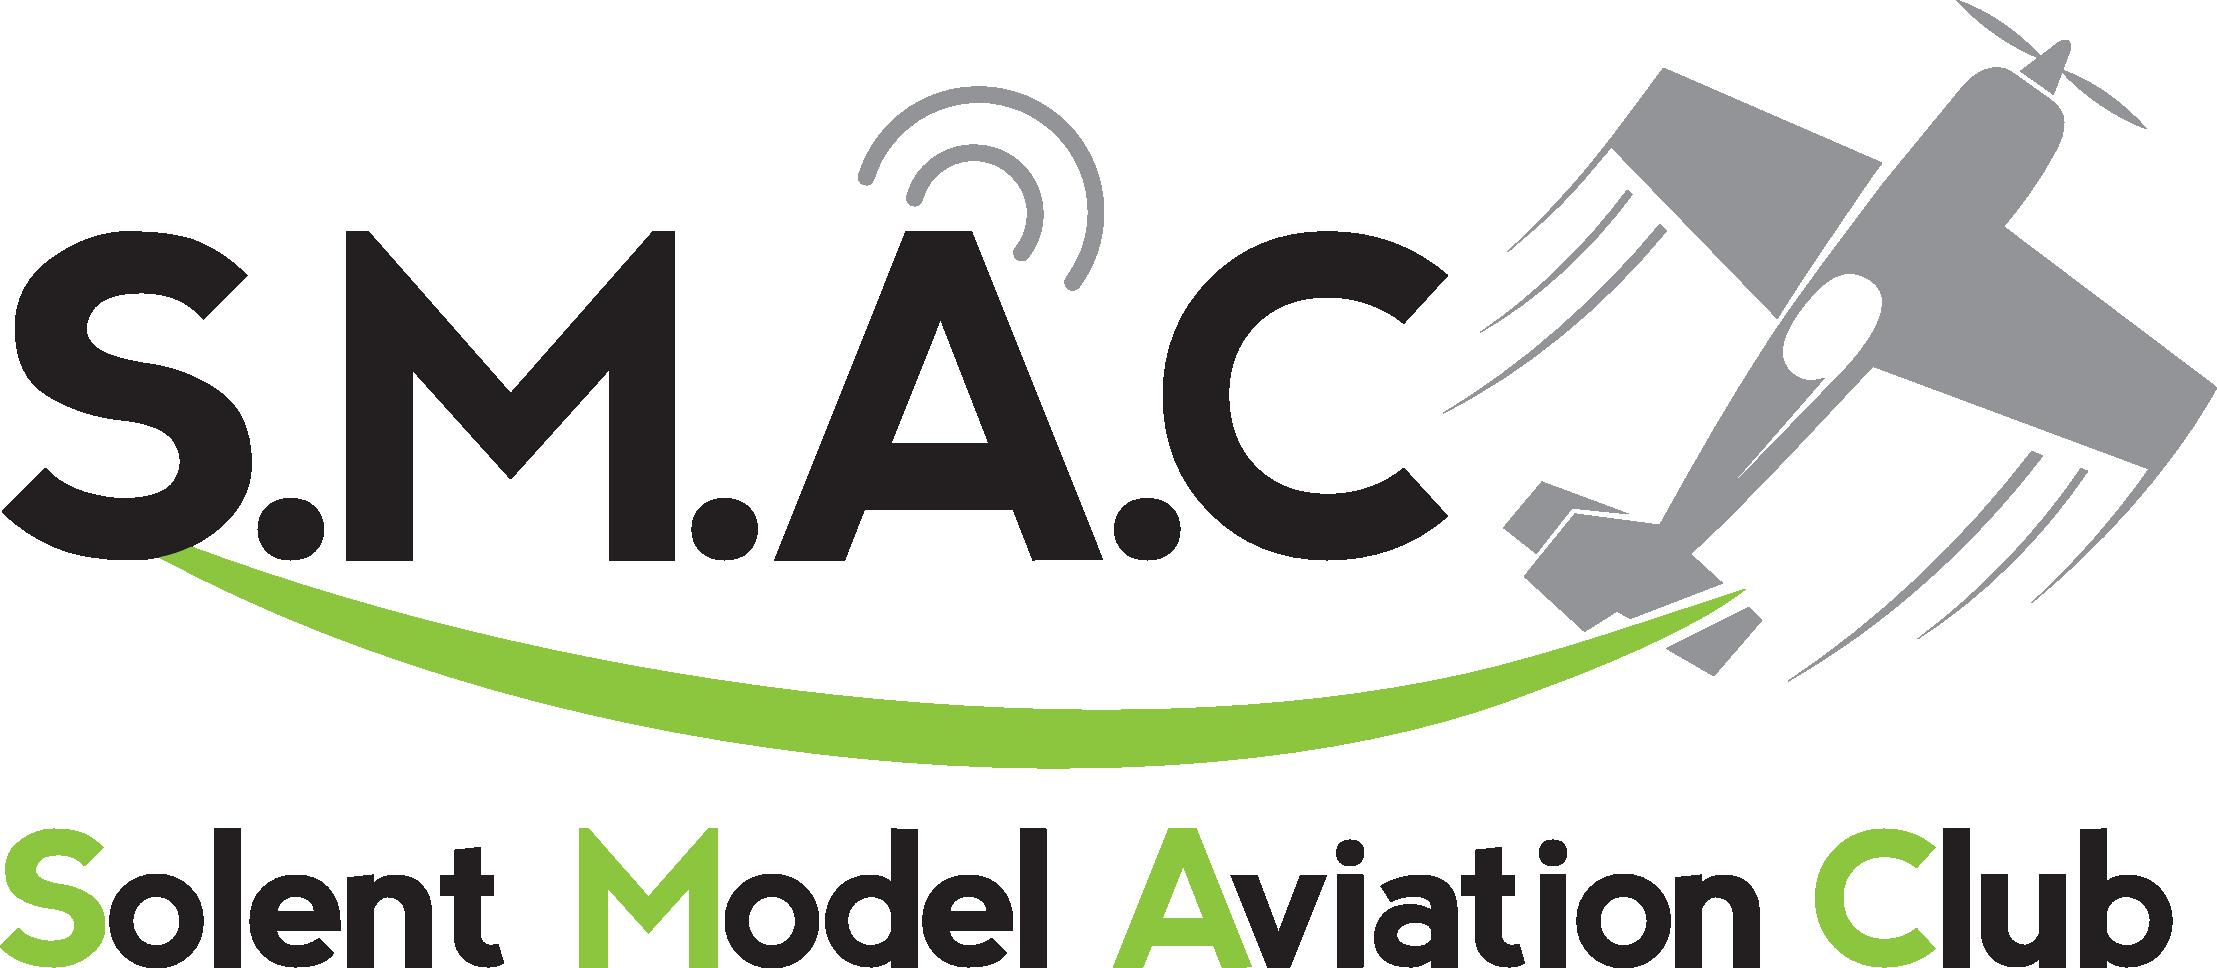 Solent Model Aviation Club